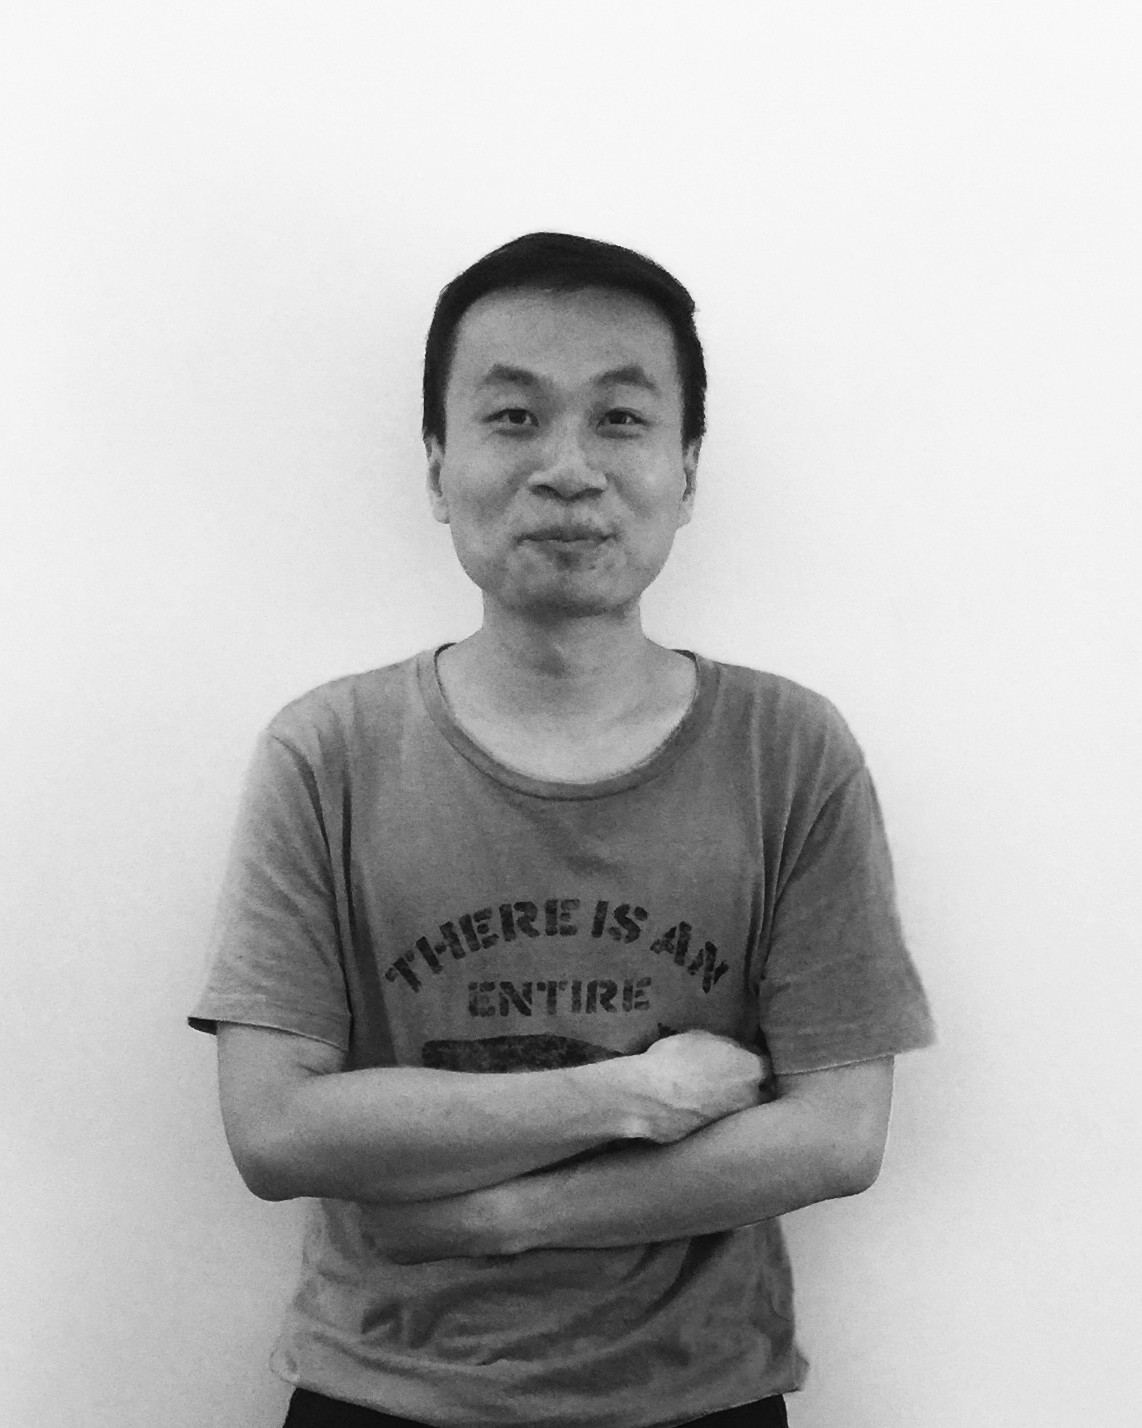 Tsung-Yen Hsieh